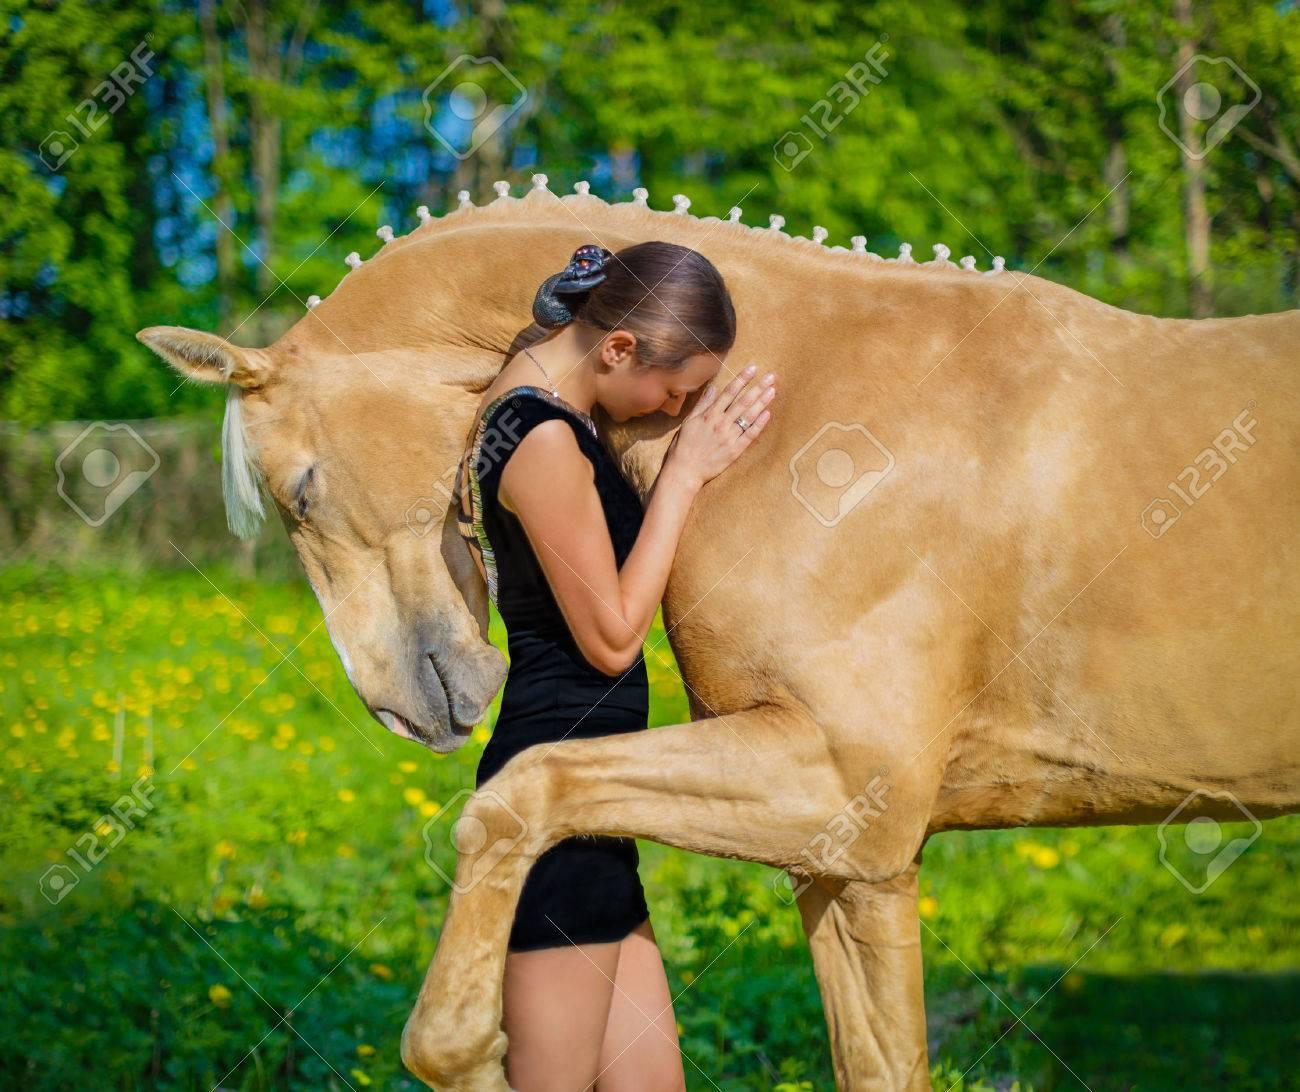 Girl hugging a horse - 40401762